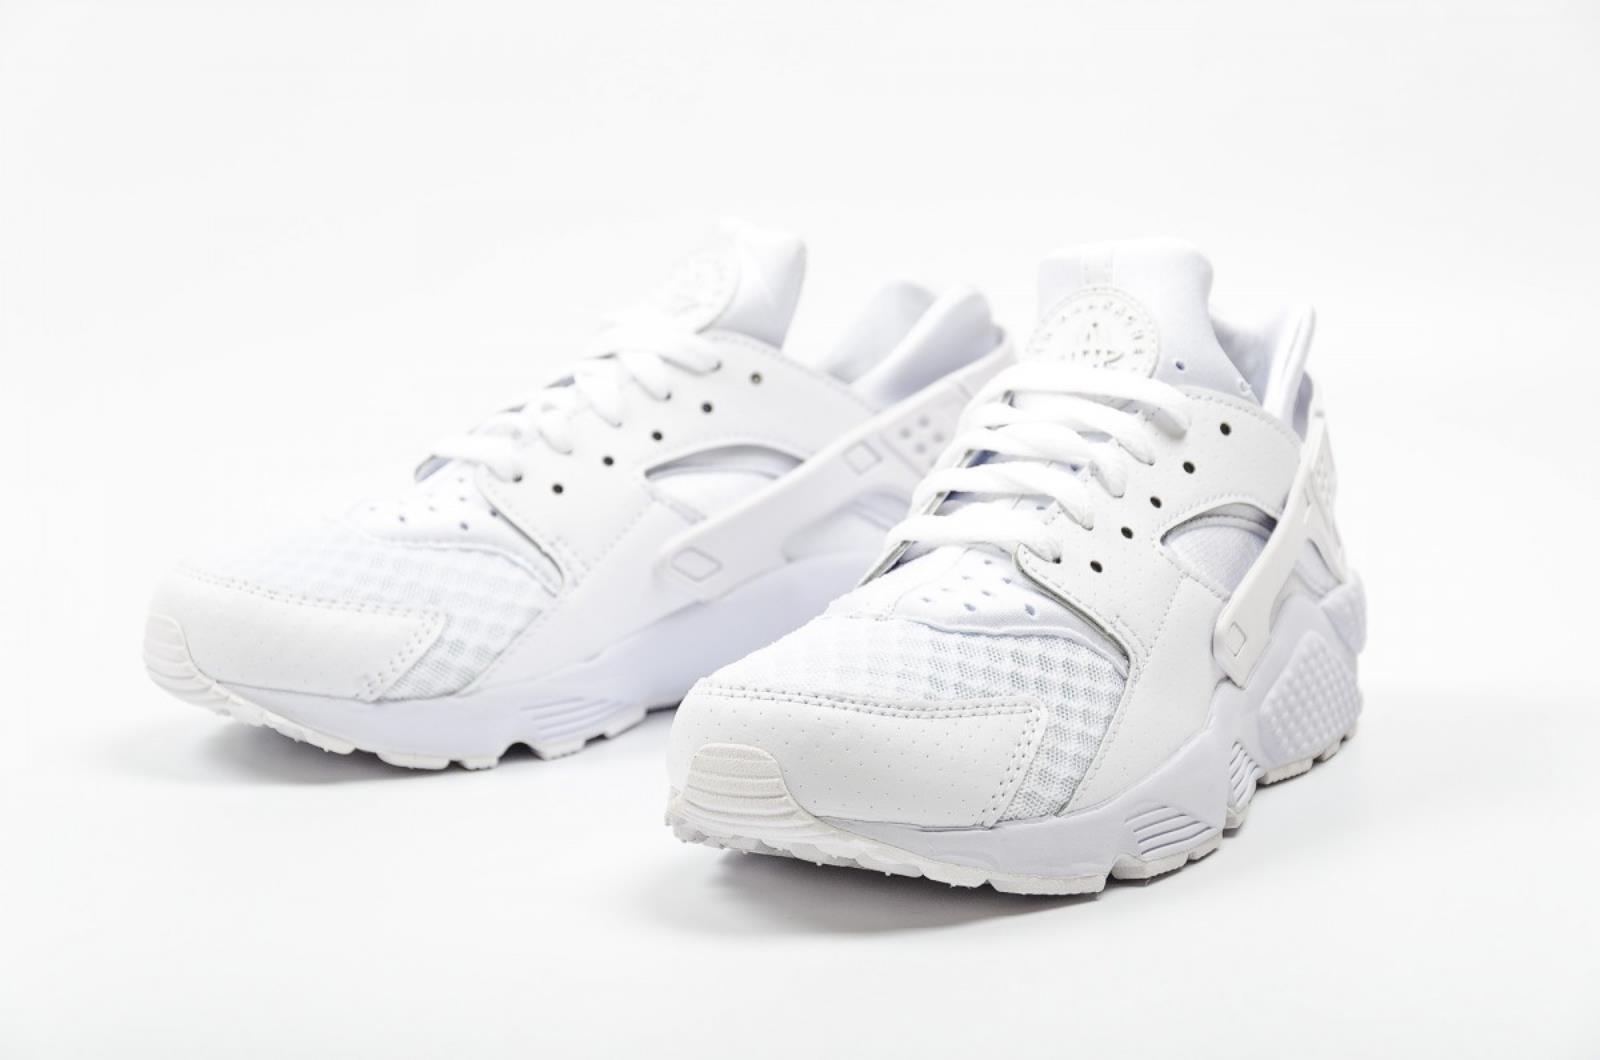 Scarpe sportive uomo-donna Nike Air Huarache Run 318429-111 bianco bianco bianco 857173